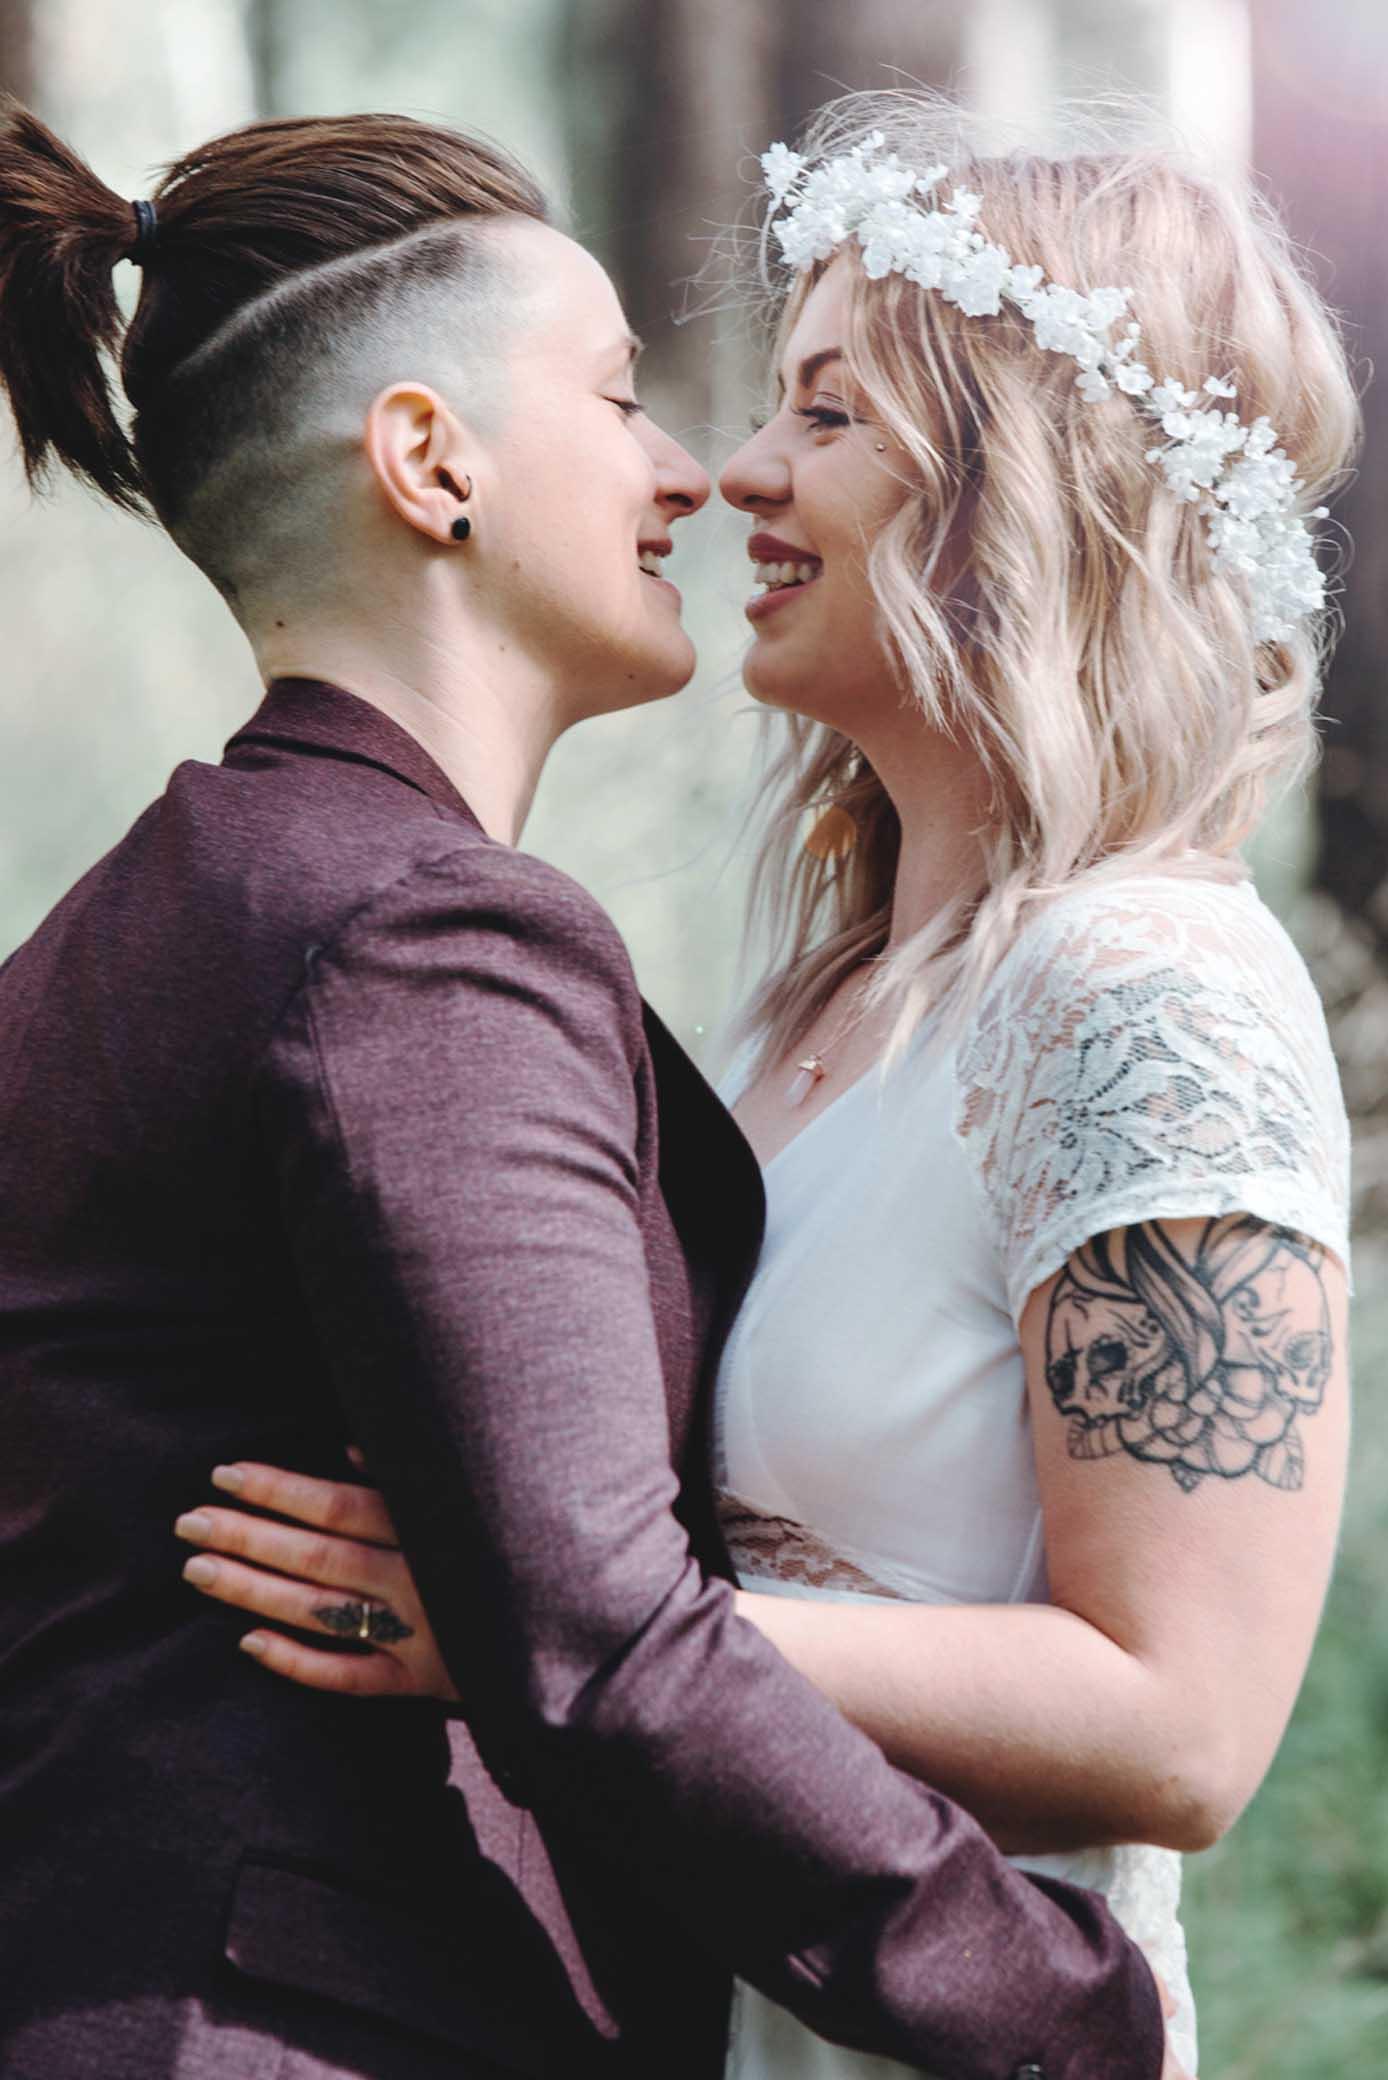 Blush Wedding Photography lesbian gay same-sex lgbt couple wedding Adelaide DIY South Australian Dancing With Her Australia